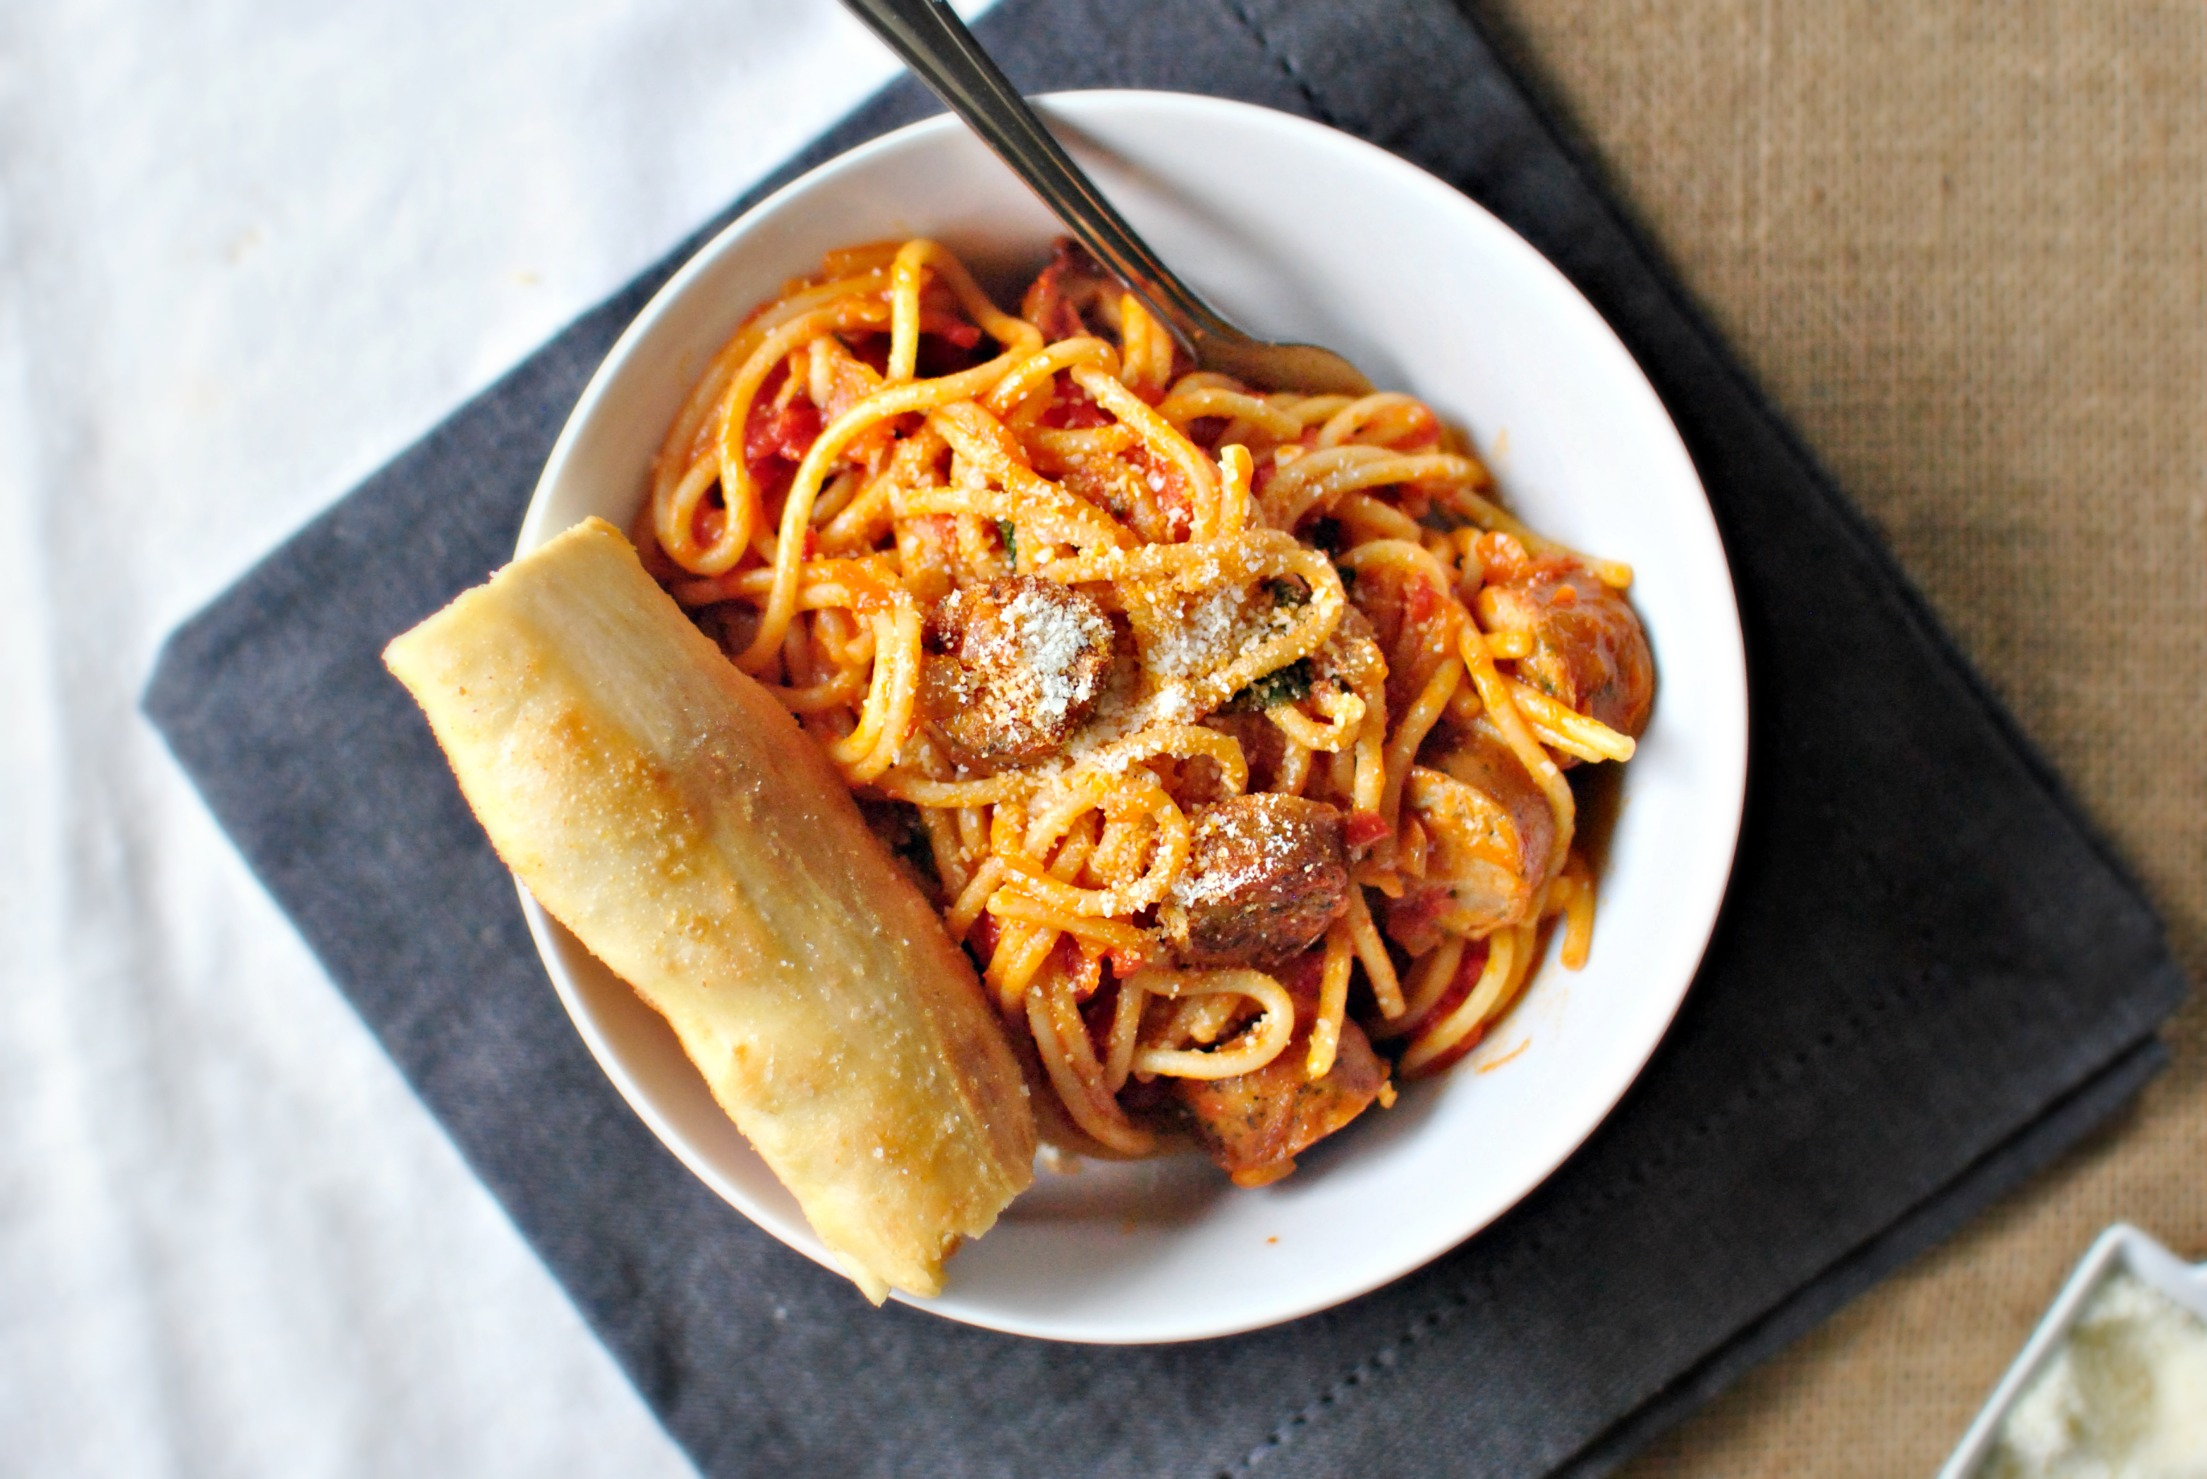 Simply Scratch Spaghetti al Pomodoro - Simply Scratch